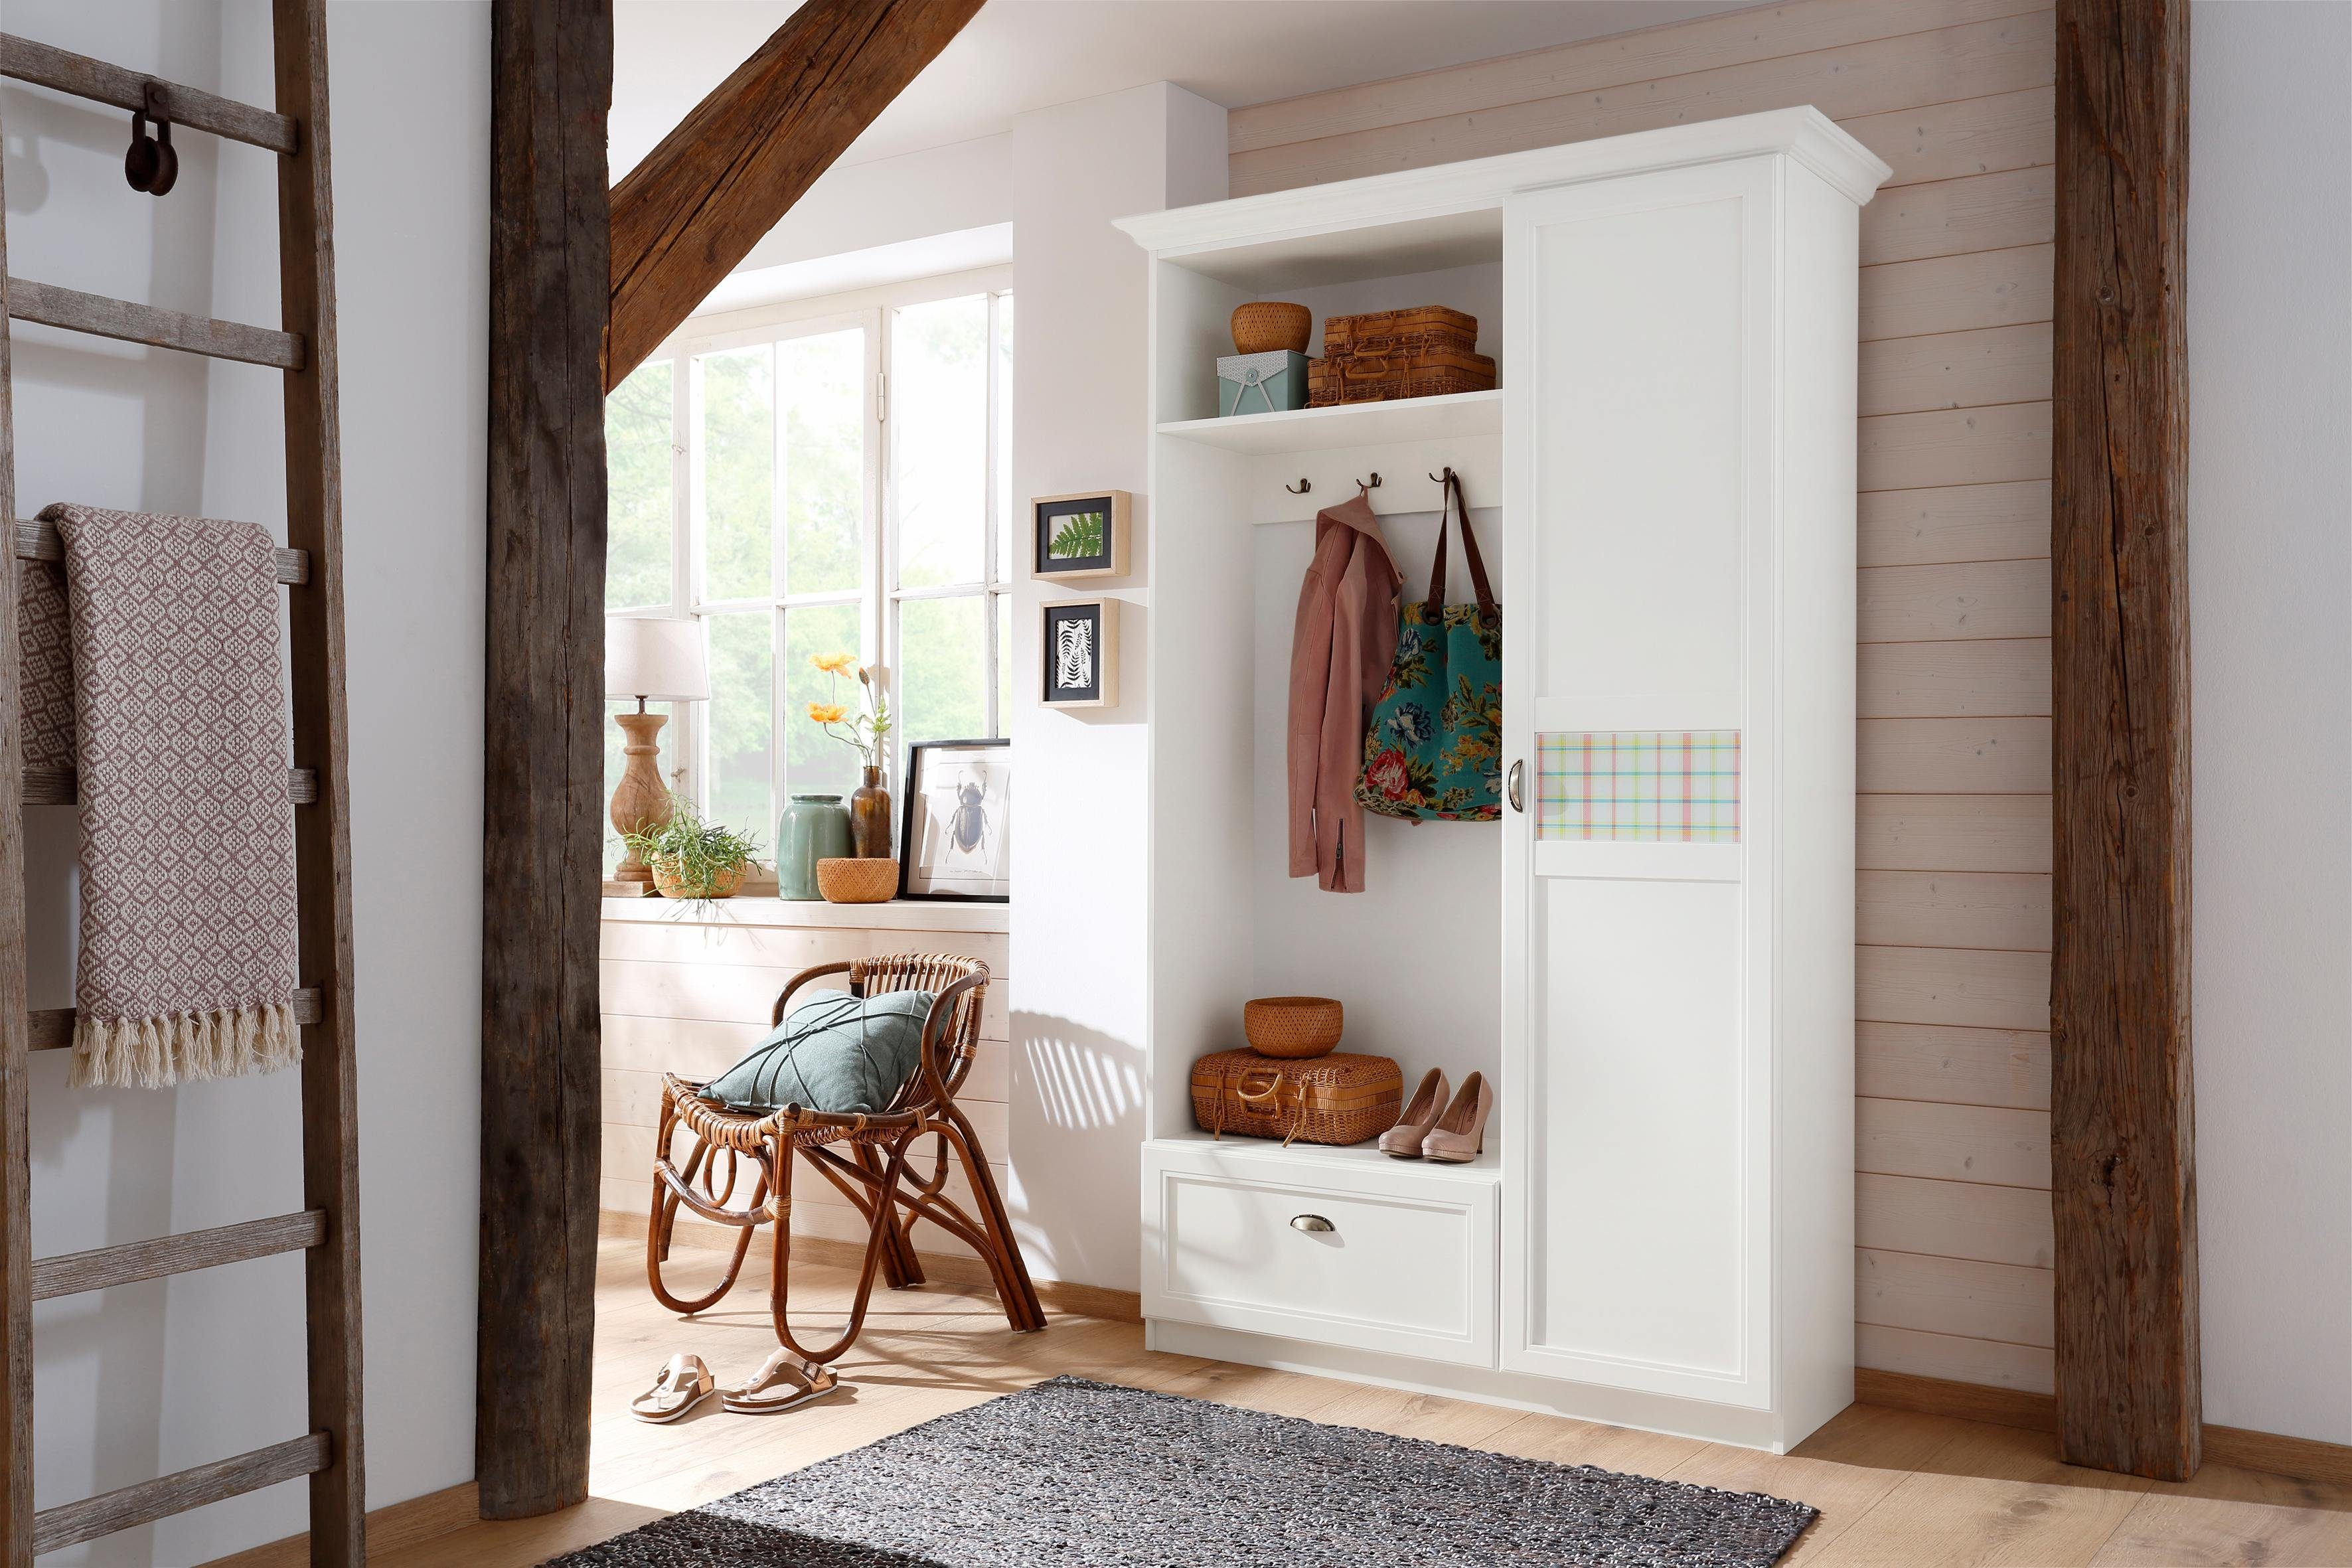 Home affaire Kompaktgarderobe »Sonya« mit dekorativem Glaseinsatz mit Karomuster - Home affaire